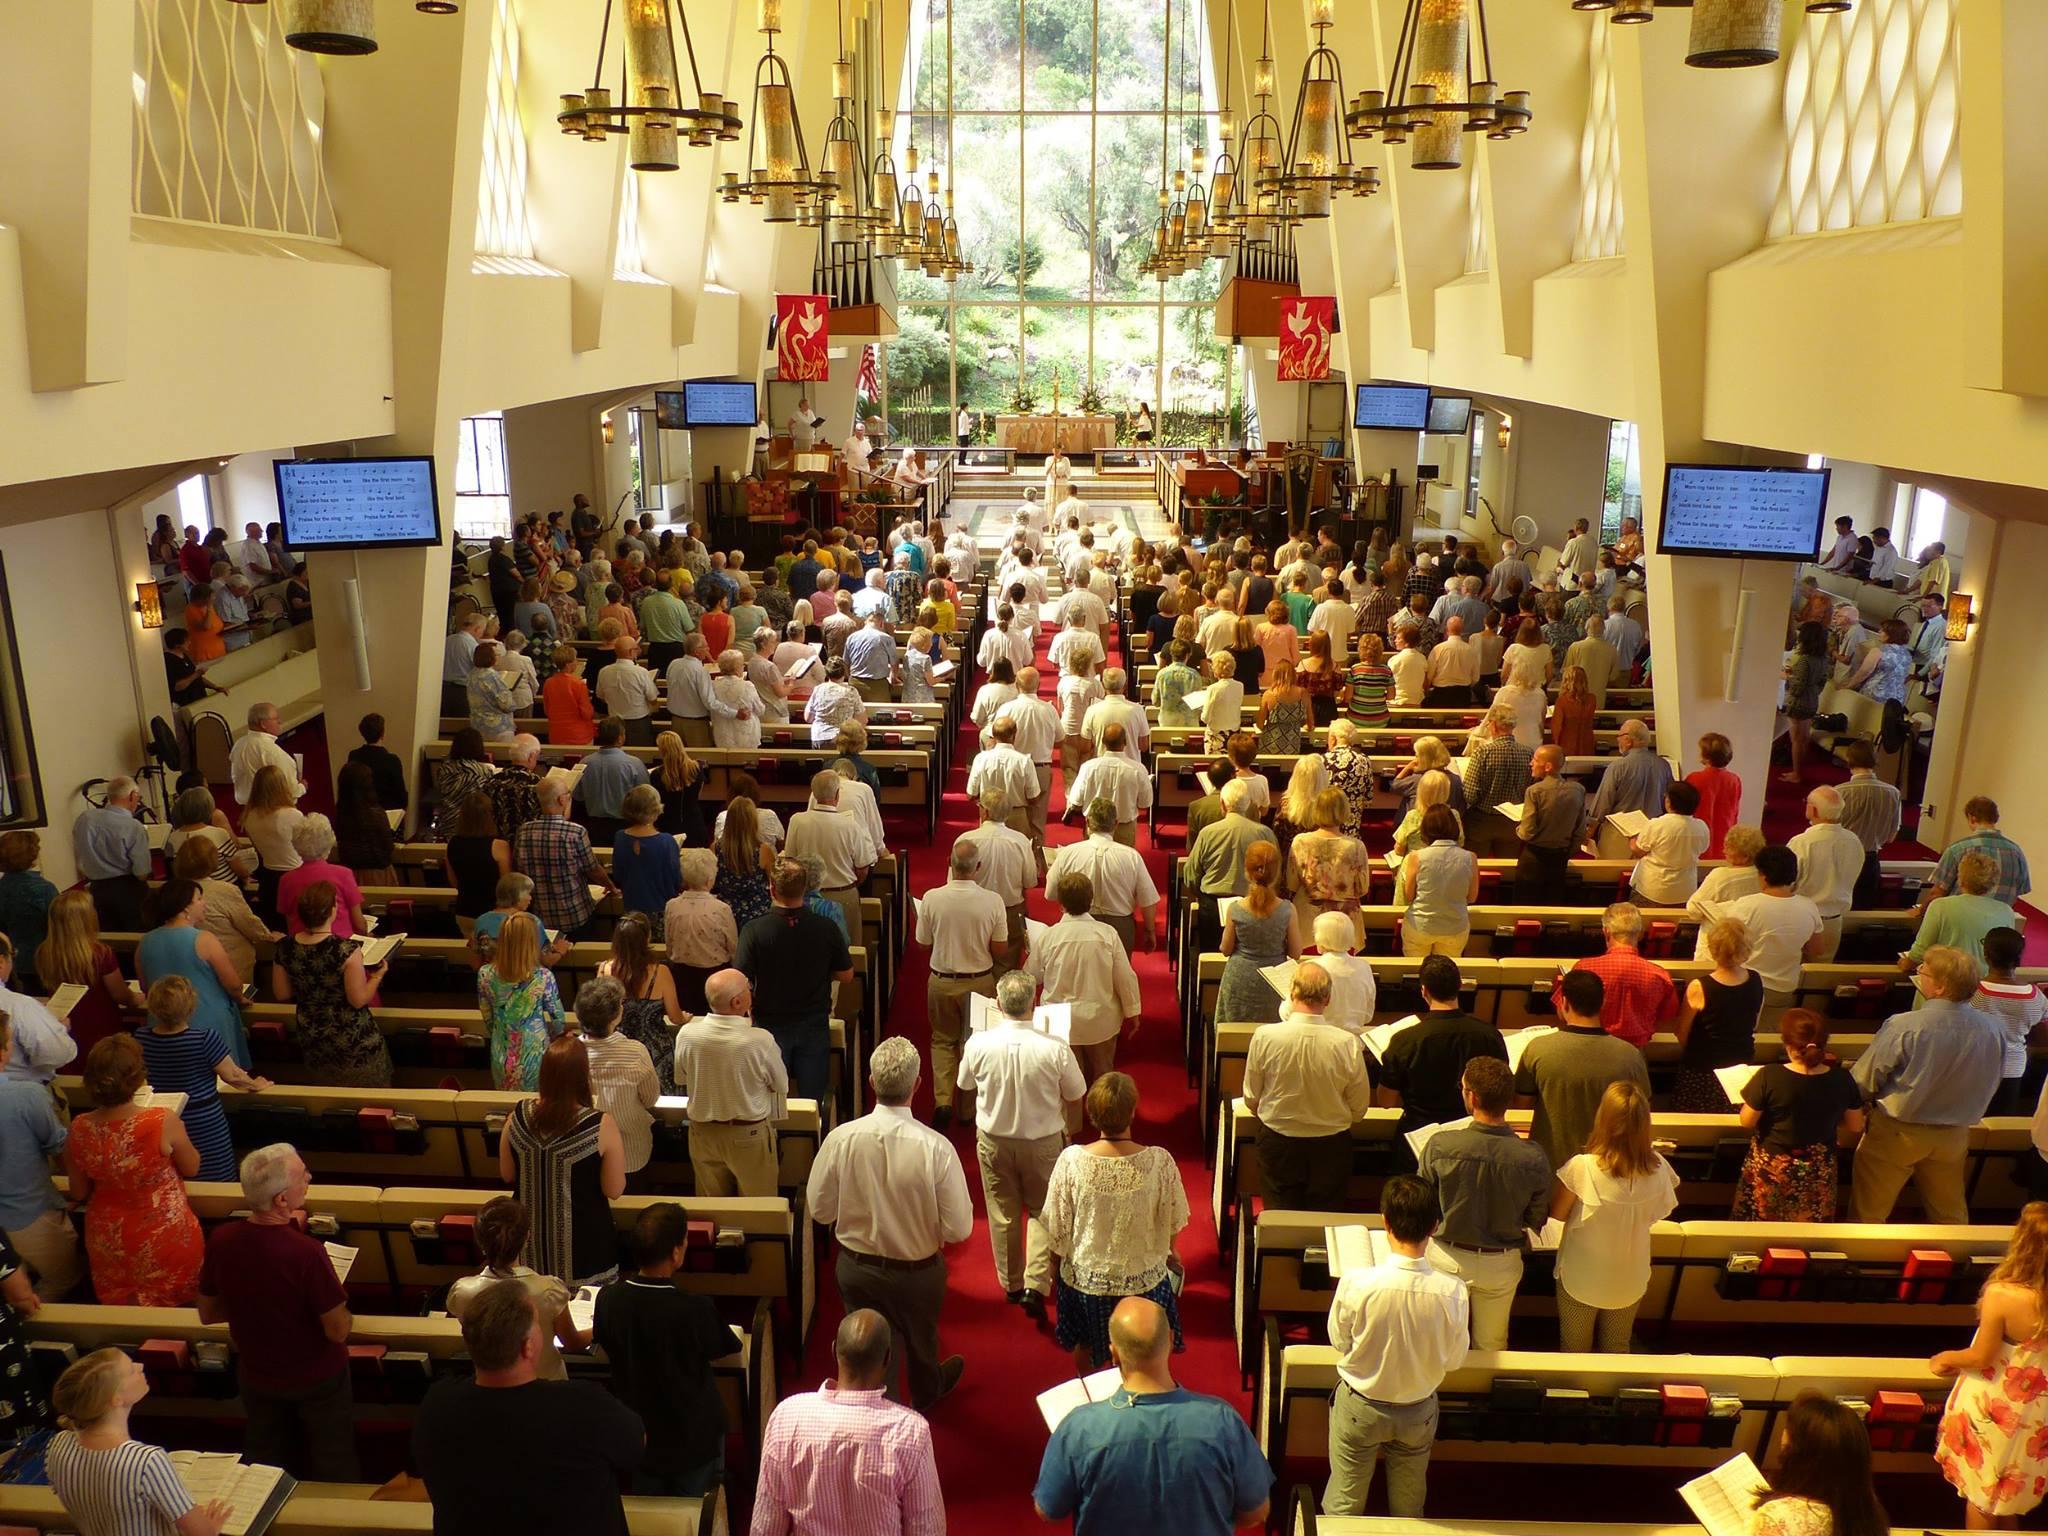 San-Diego-First-United-Methodist-Church-worship-gathering